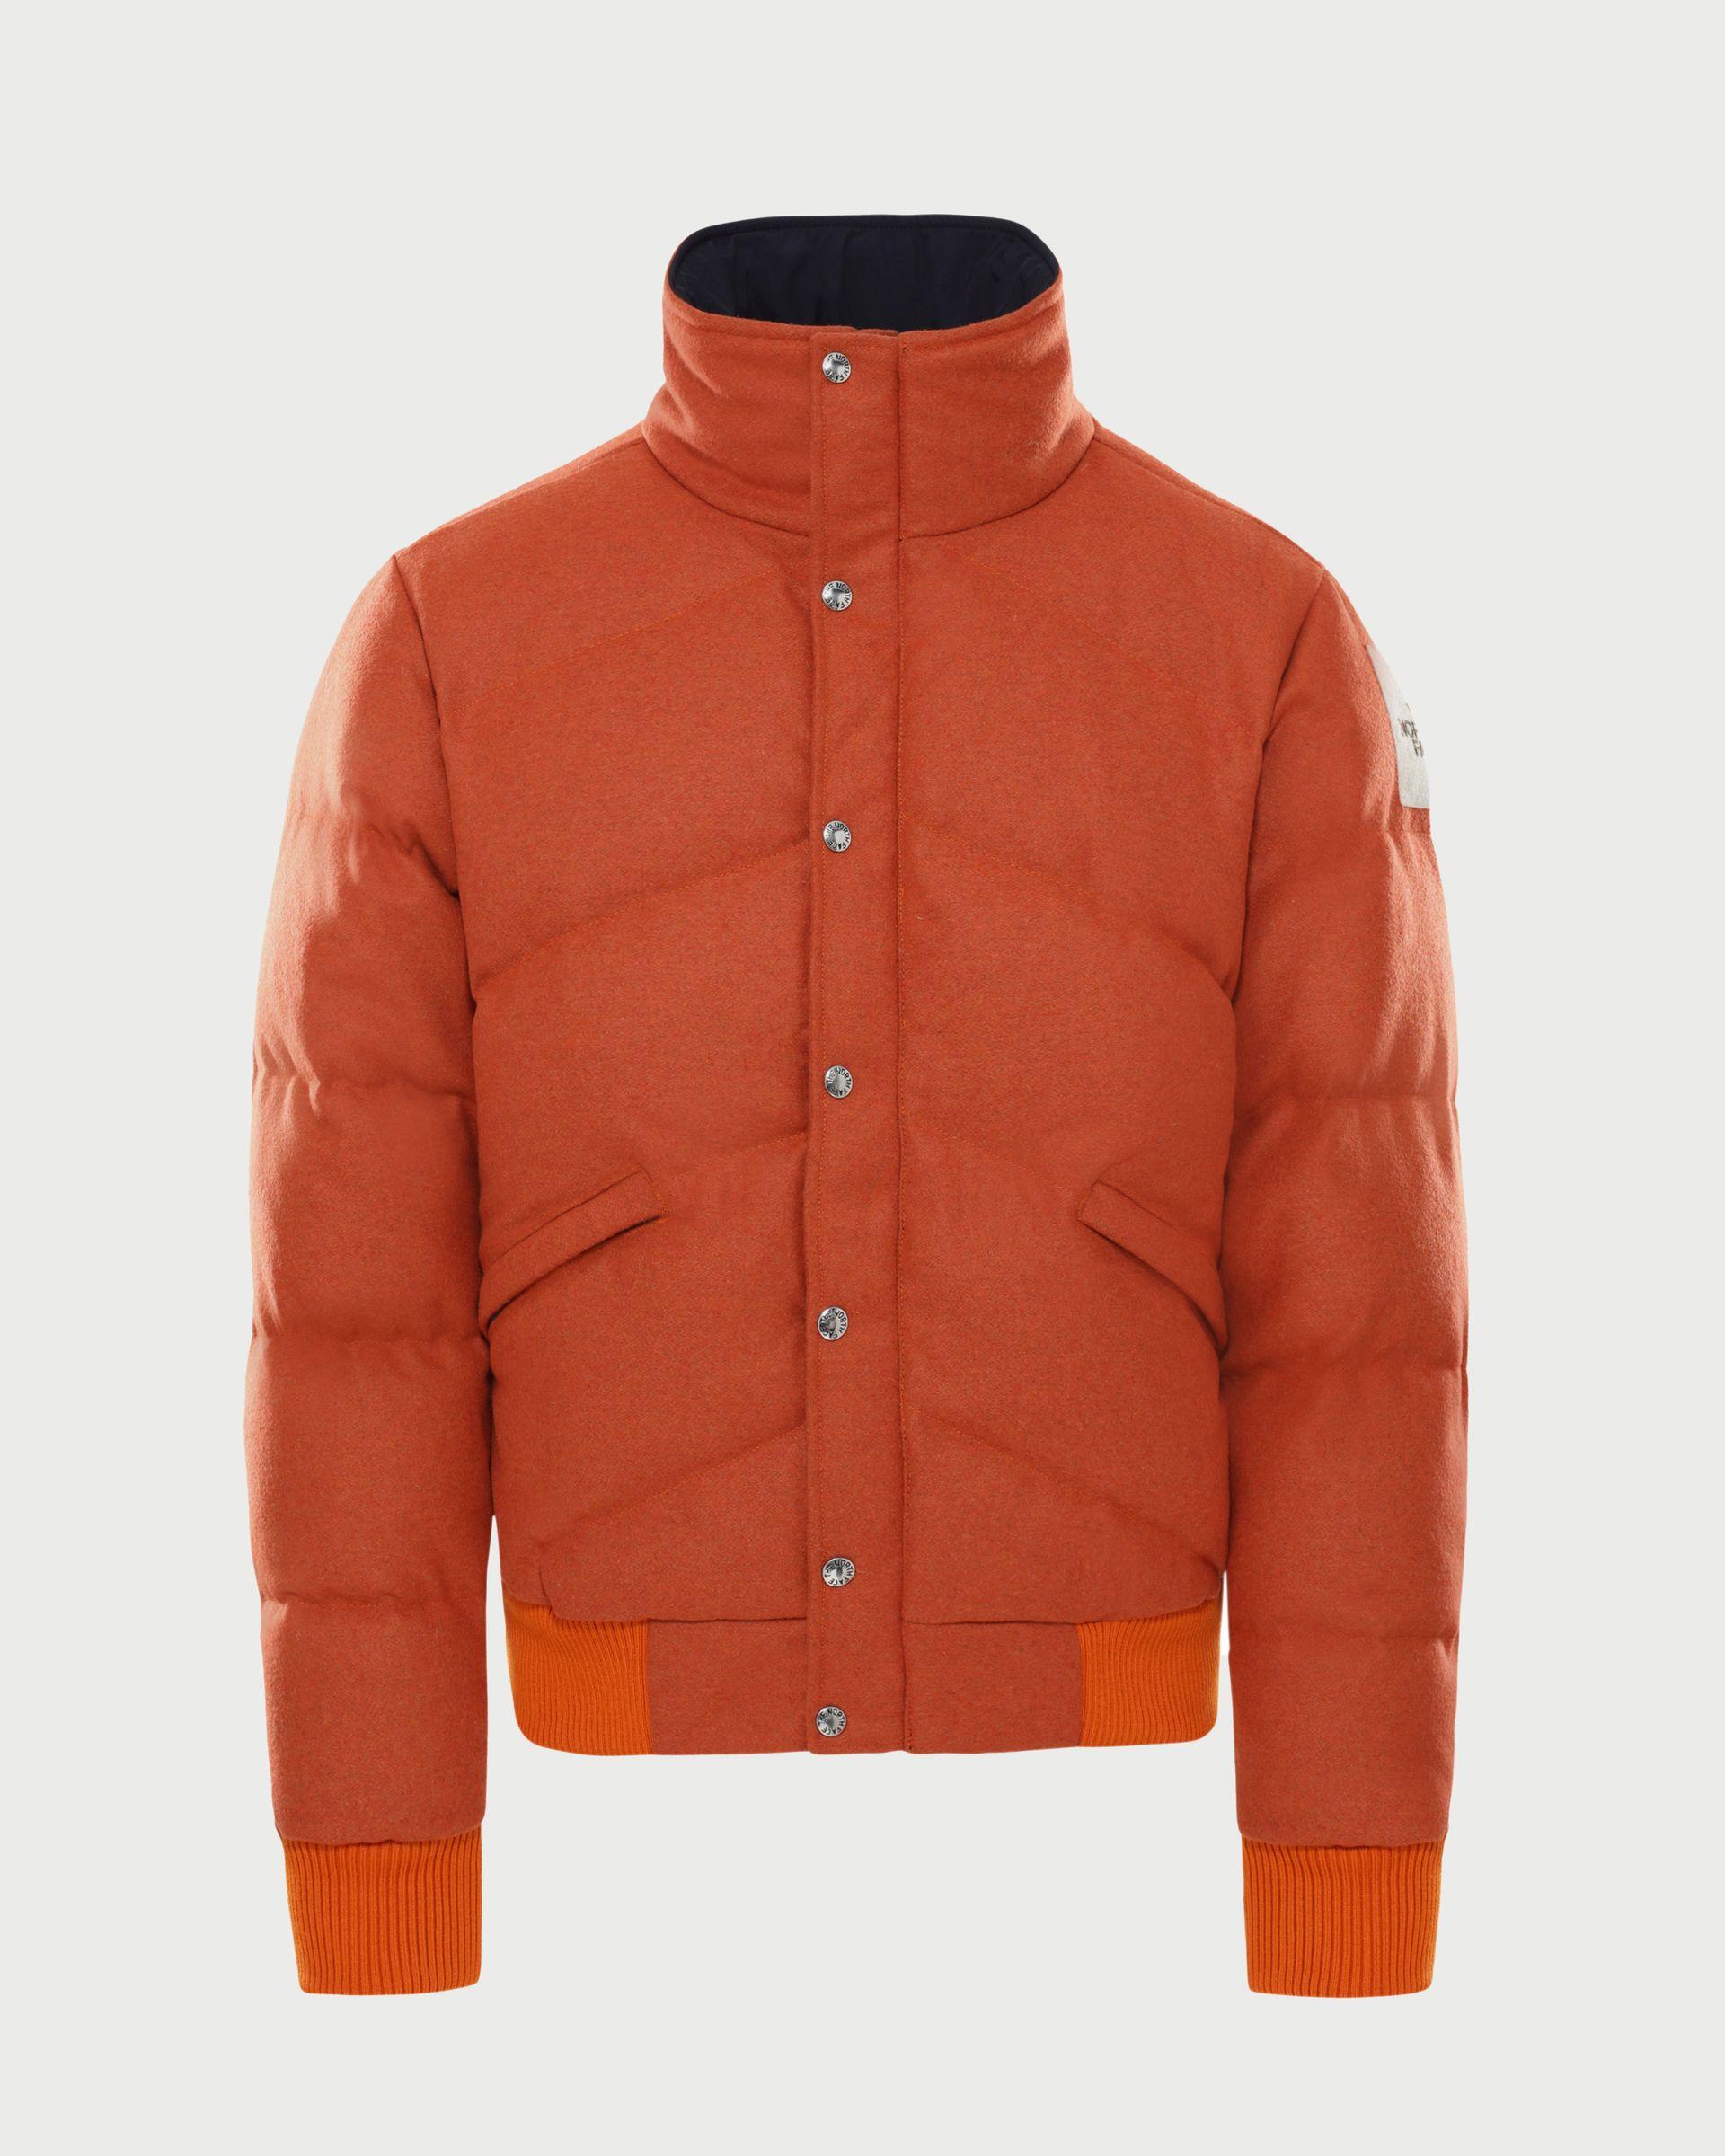 The North Face Brown Label - Larkspur Wool Down Jacket Heritage Orange Men - Image 1